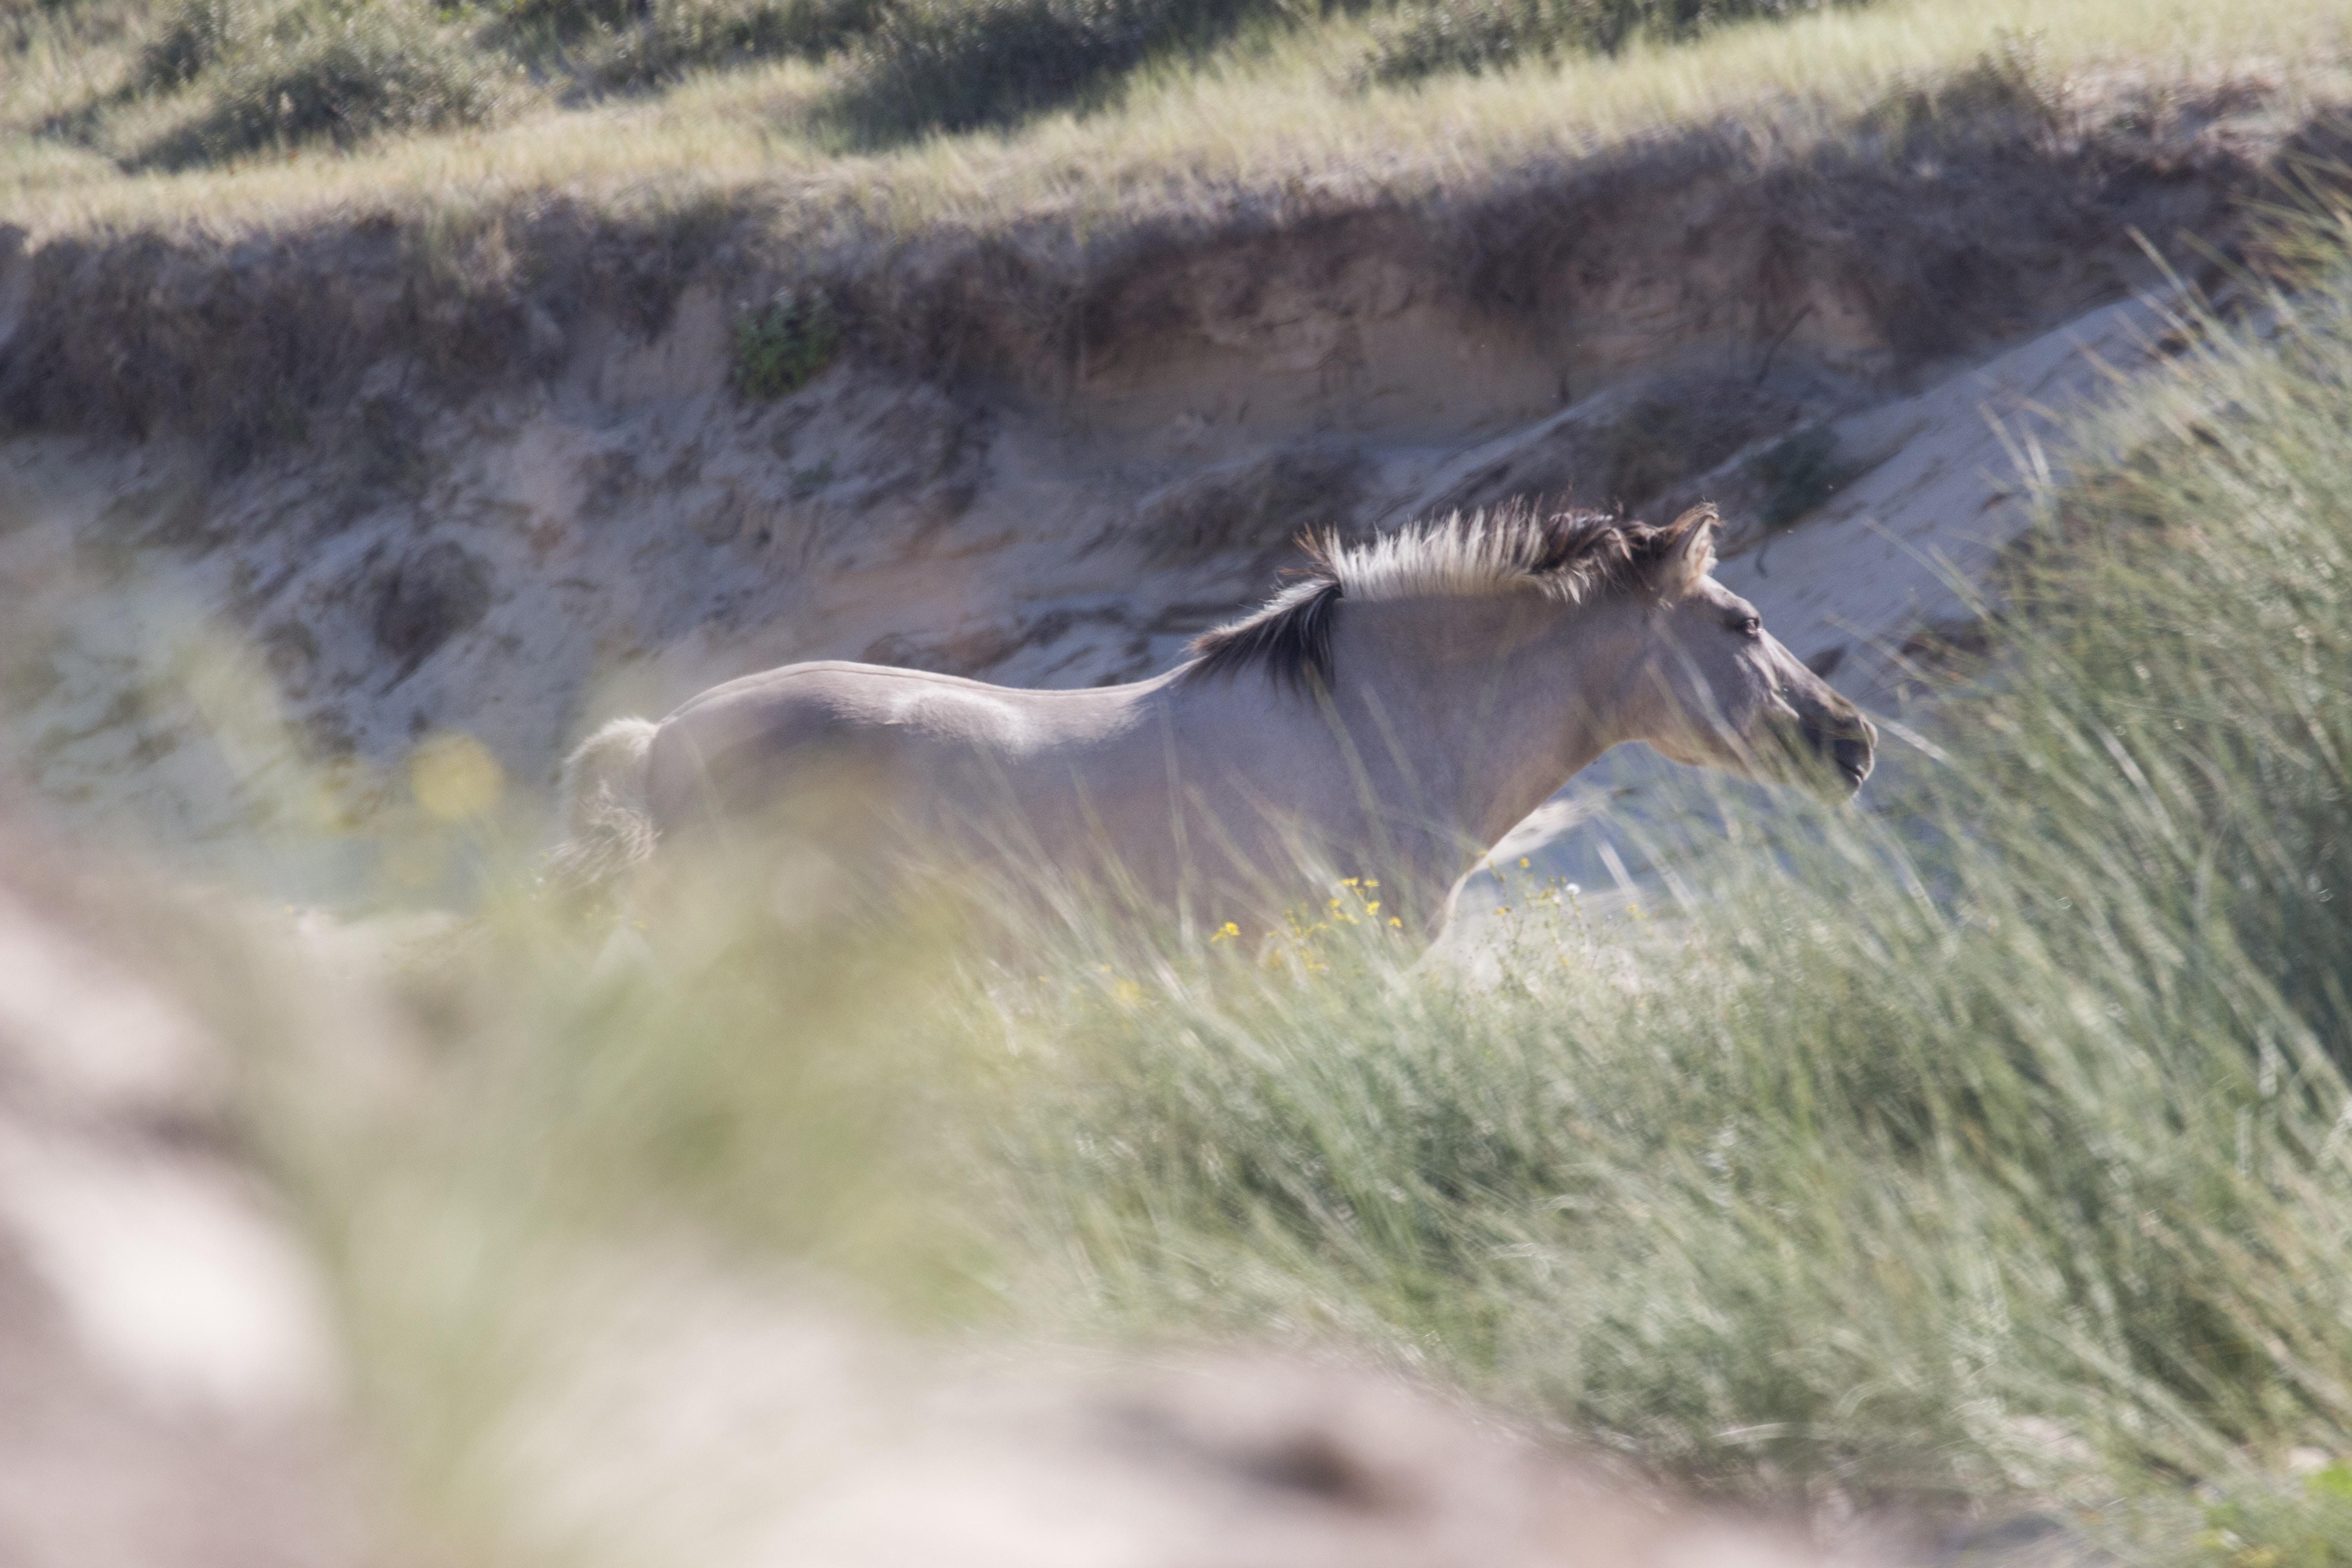 beige horse near grasses during daytime